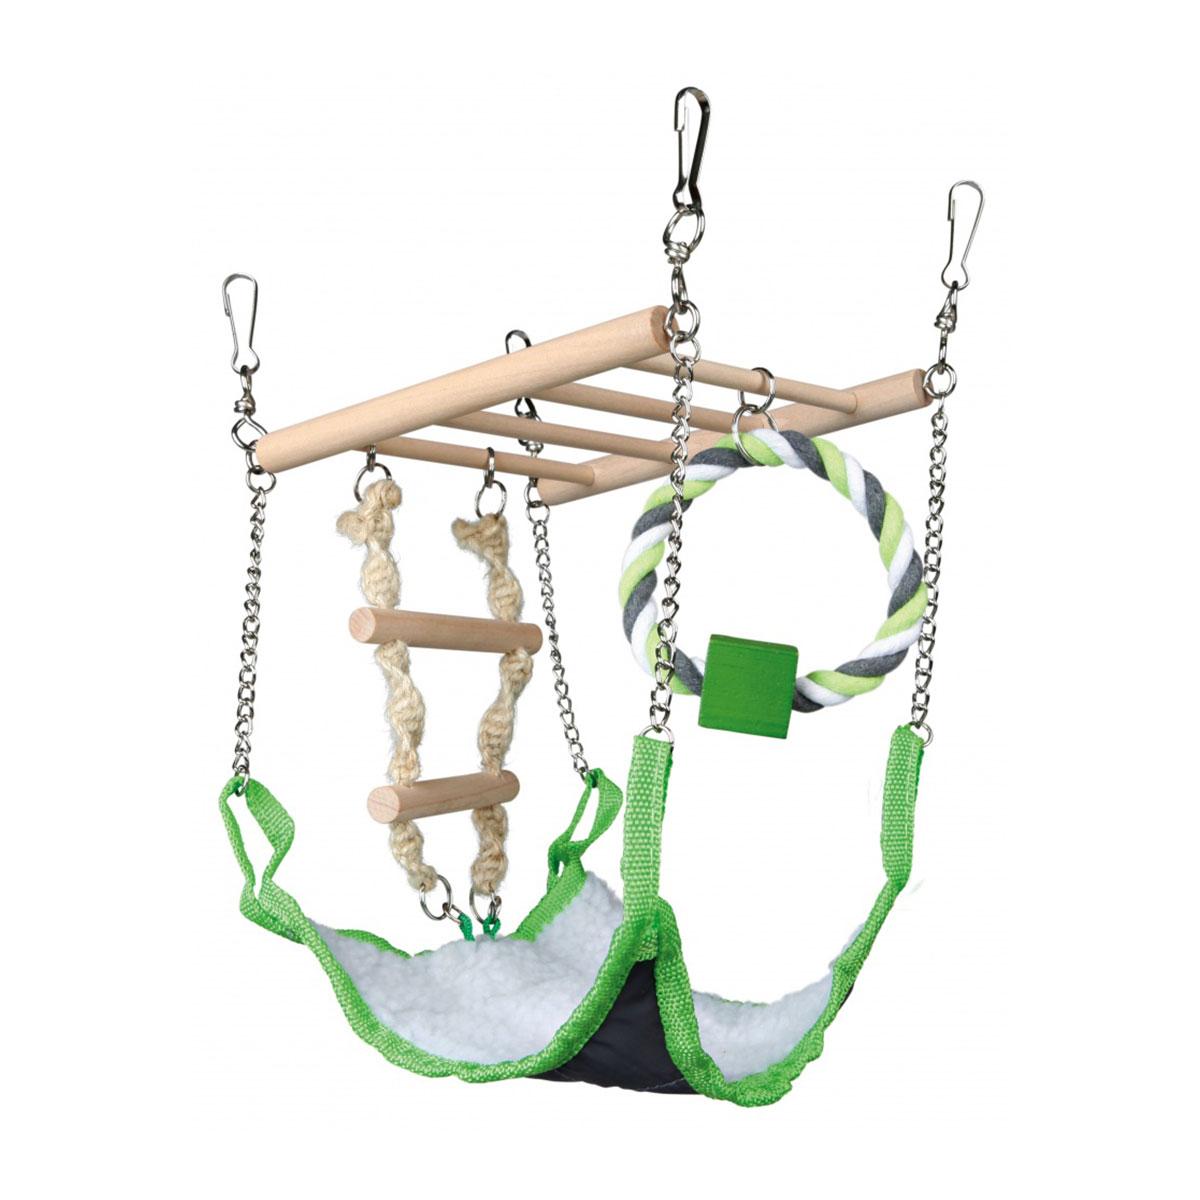 trixie h ngebr cke mit h ngematte g nstig kaufen bei zooroyal. Black Bedroom Furniture Sets. Home Design Ideas